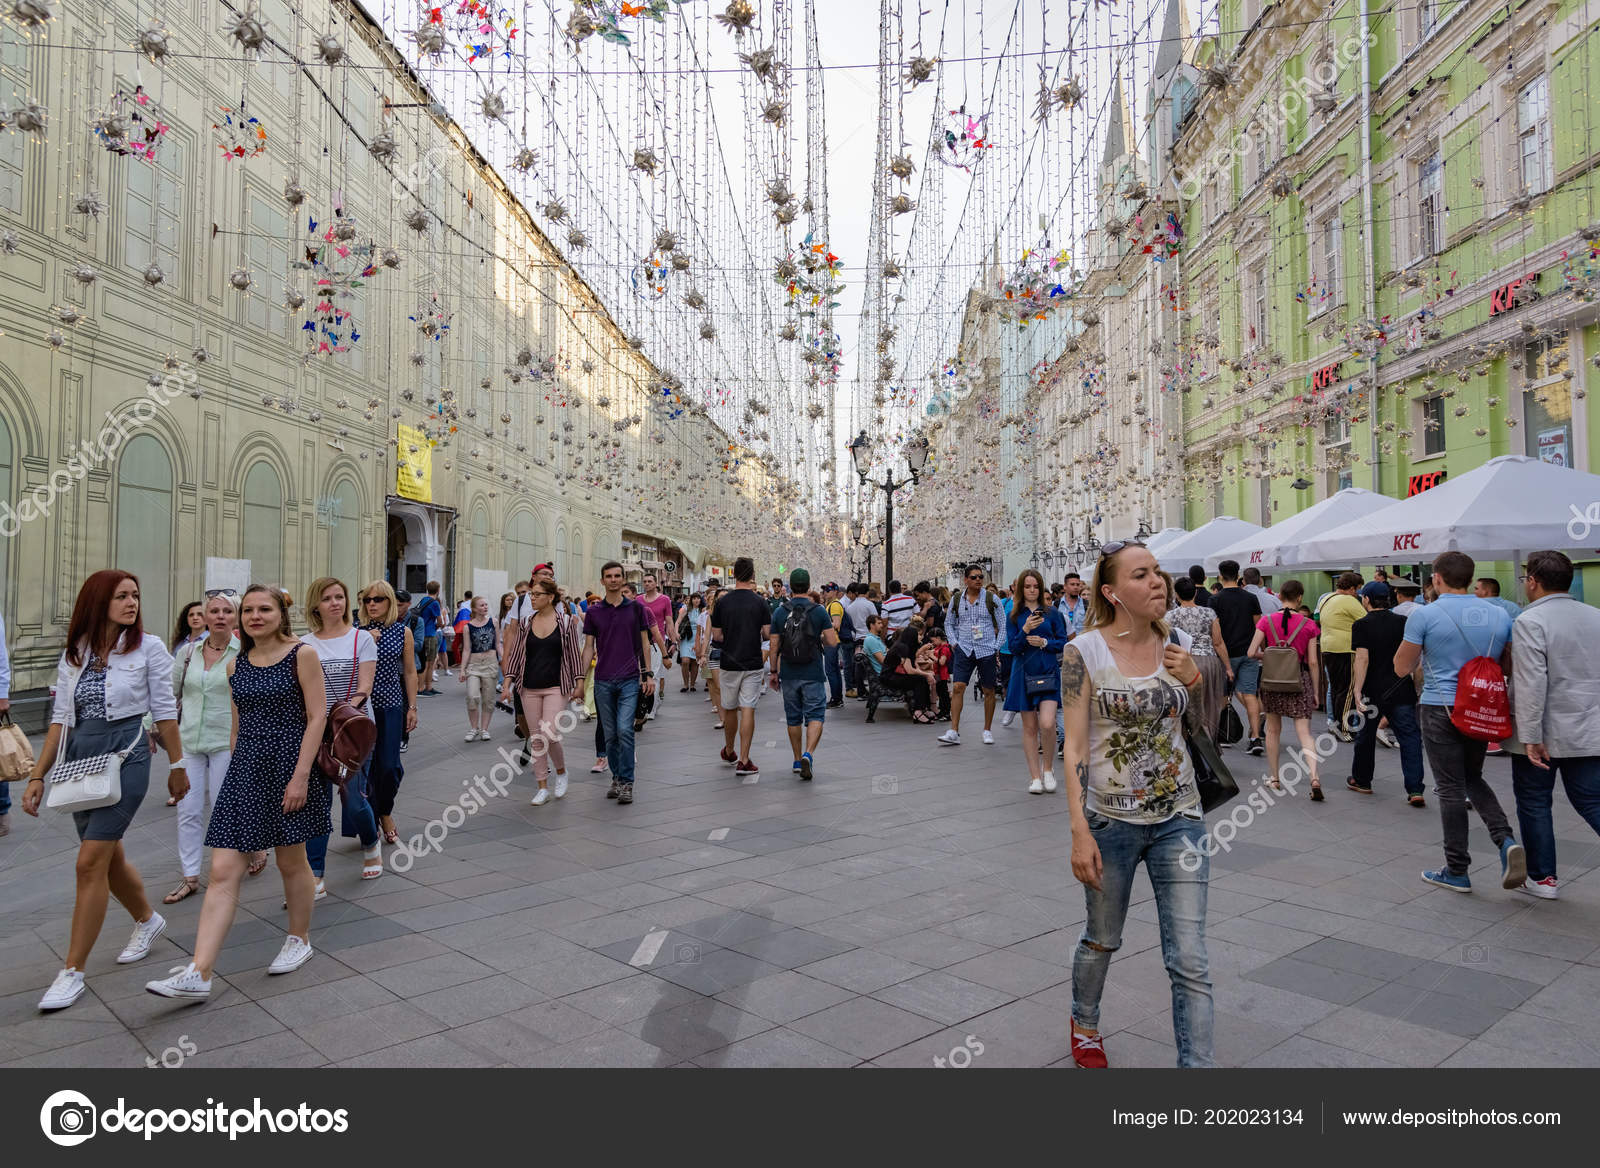 Russia Moscow June 2018 2018 Fifa World Cup Nikolskaya